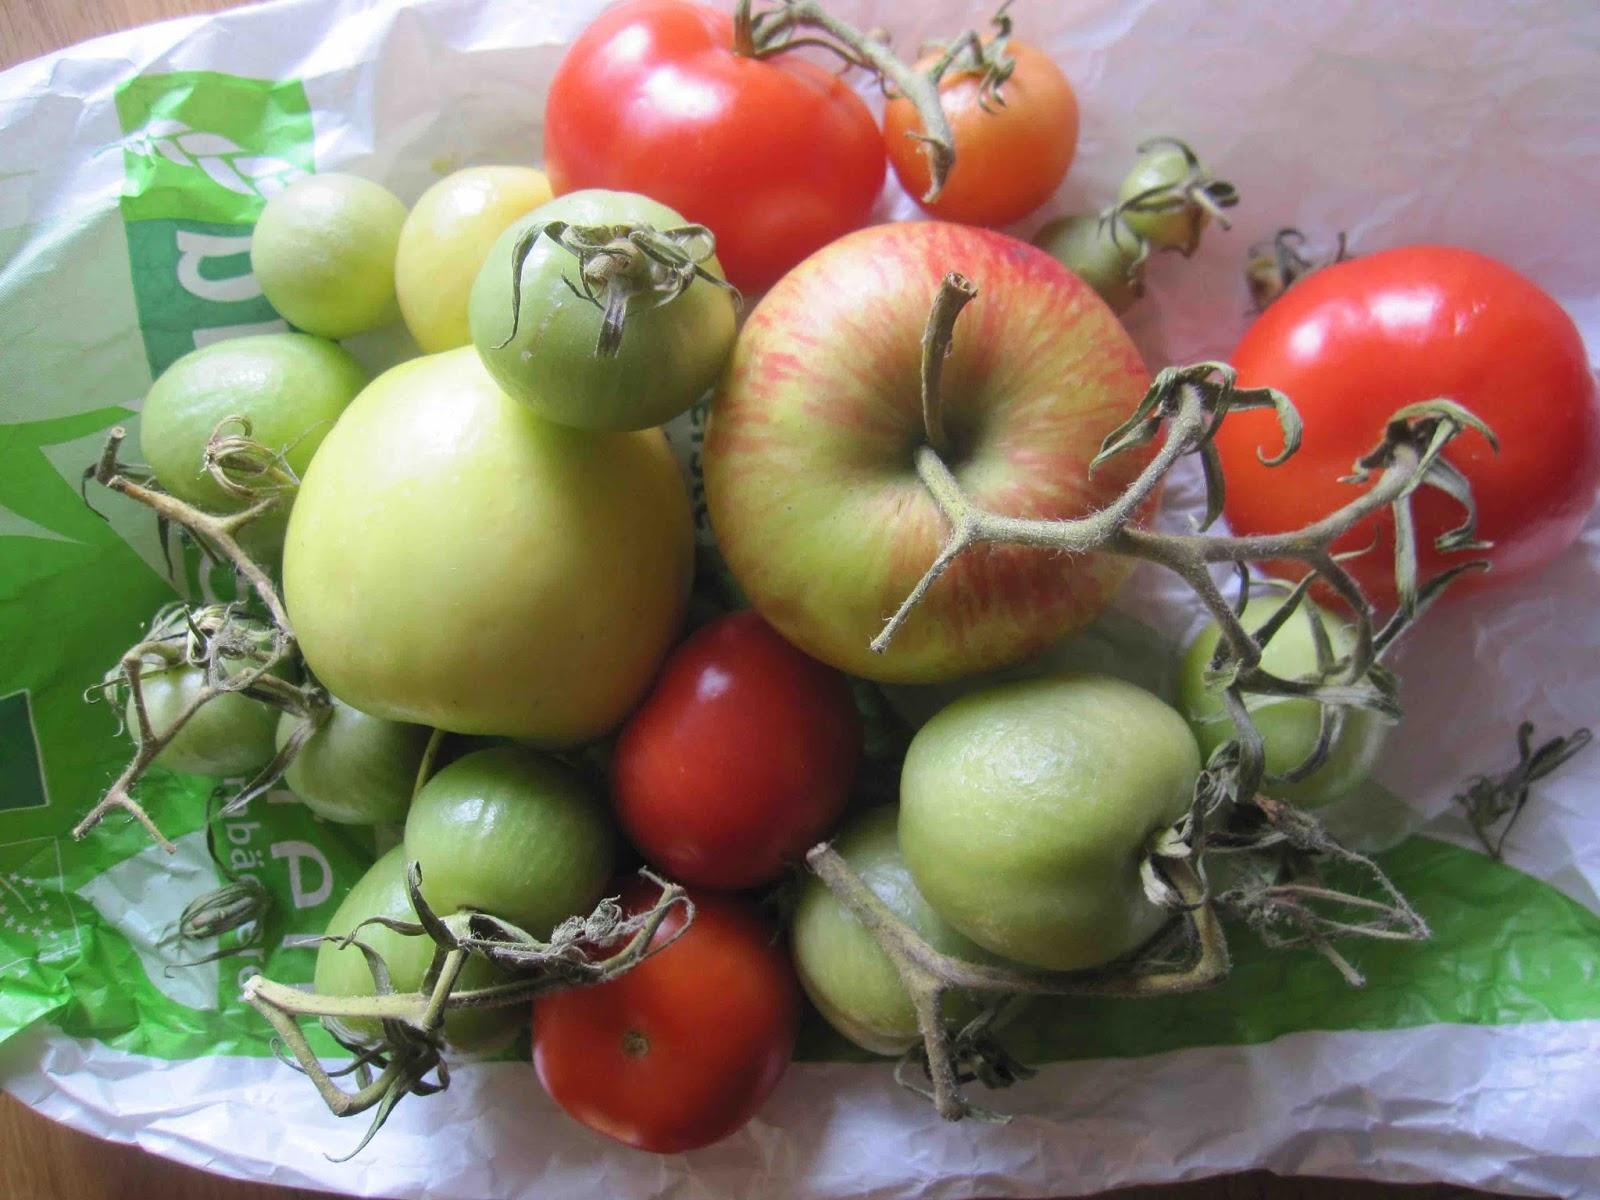 wunder bare sch tze gr ne tomaten err ten lassen. Black Bedroom Furniture Sets. Home Design Ideas